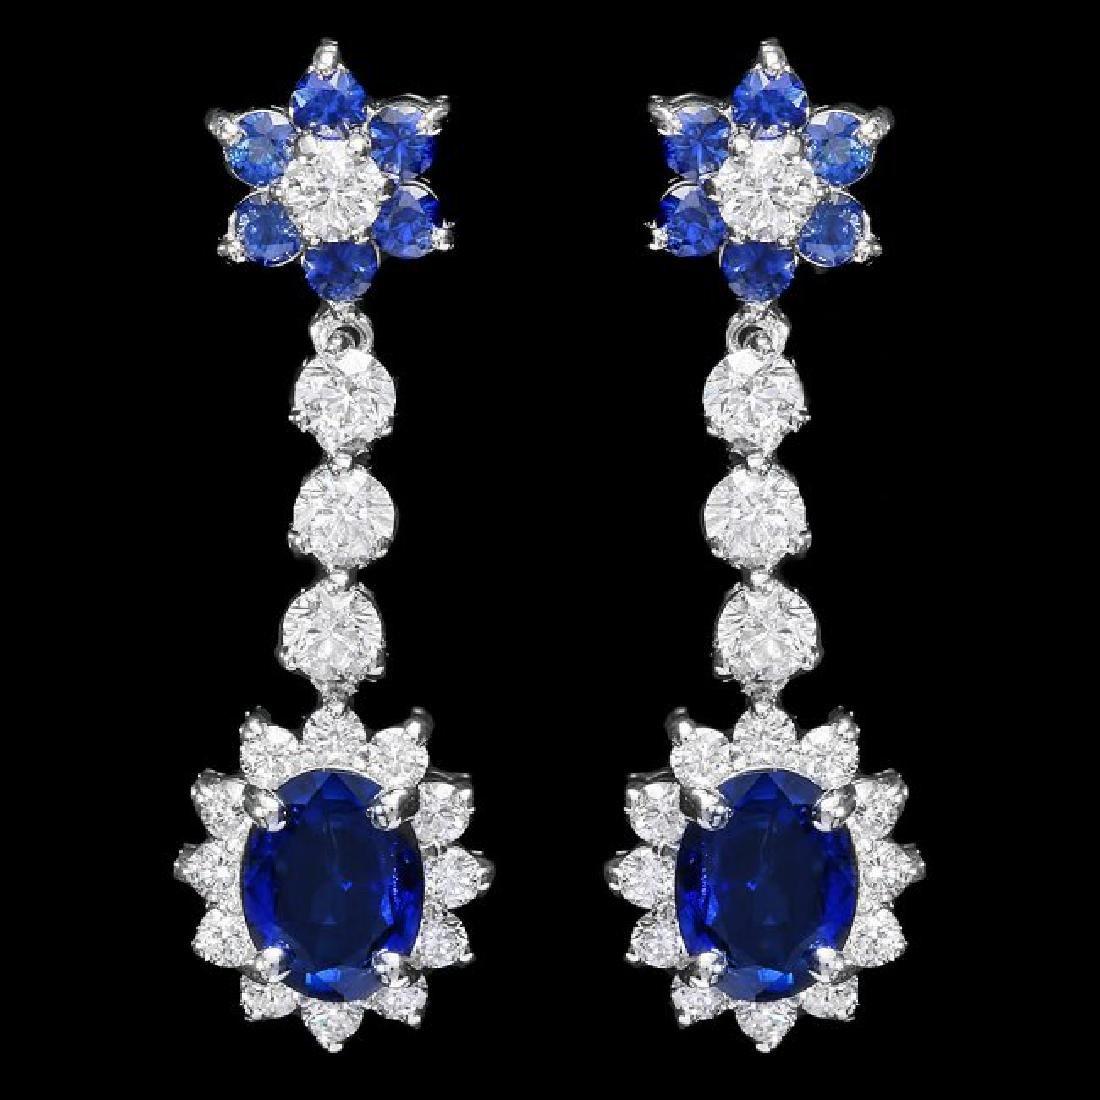 14k Gold 3.85ct Sapphire 2ct Diamond Earrings